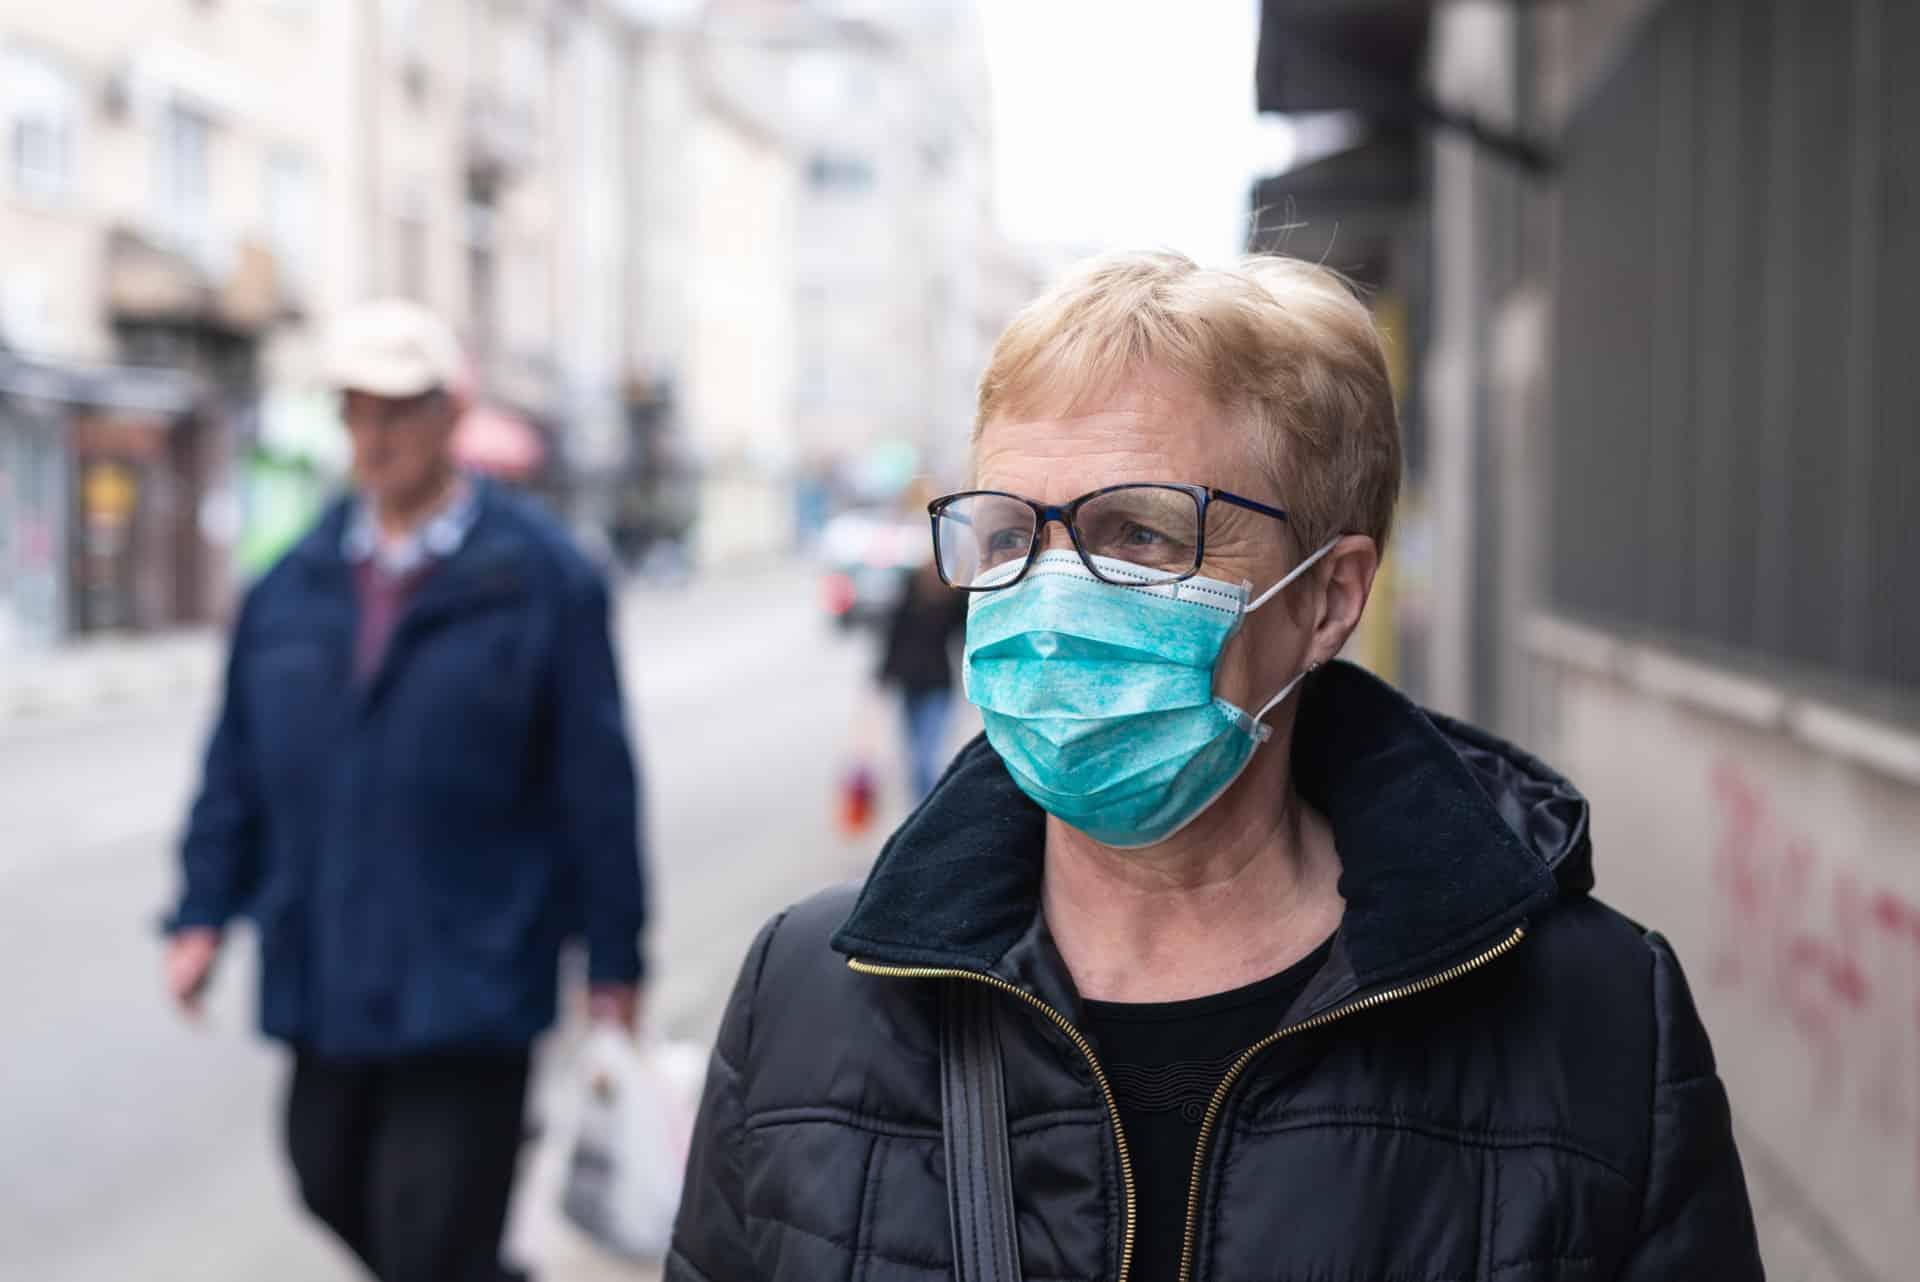 Seniorin mit Maske gegen das Corona-Virus